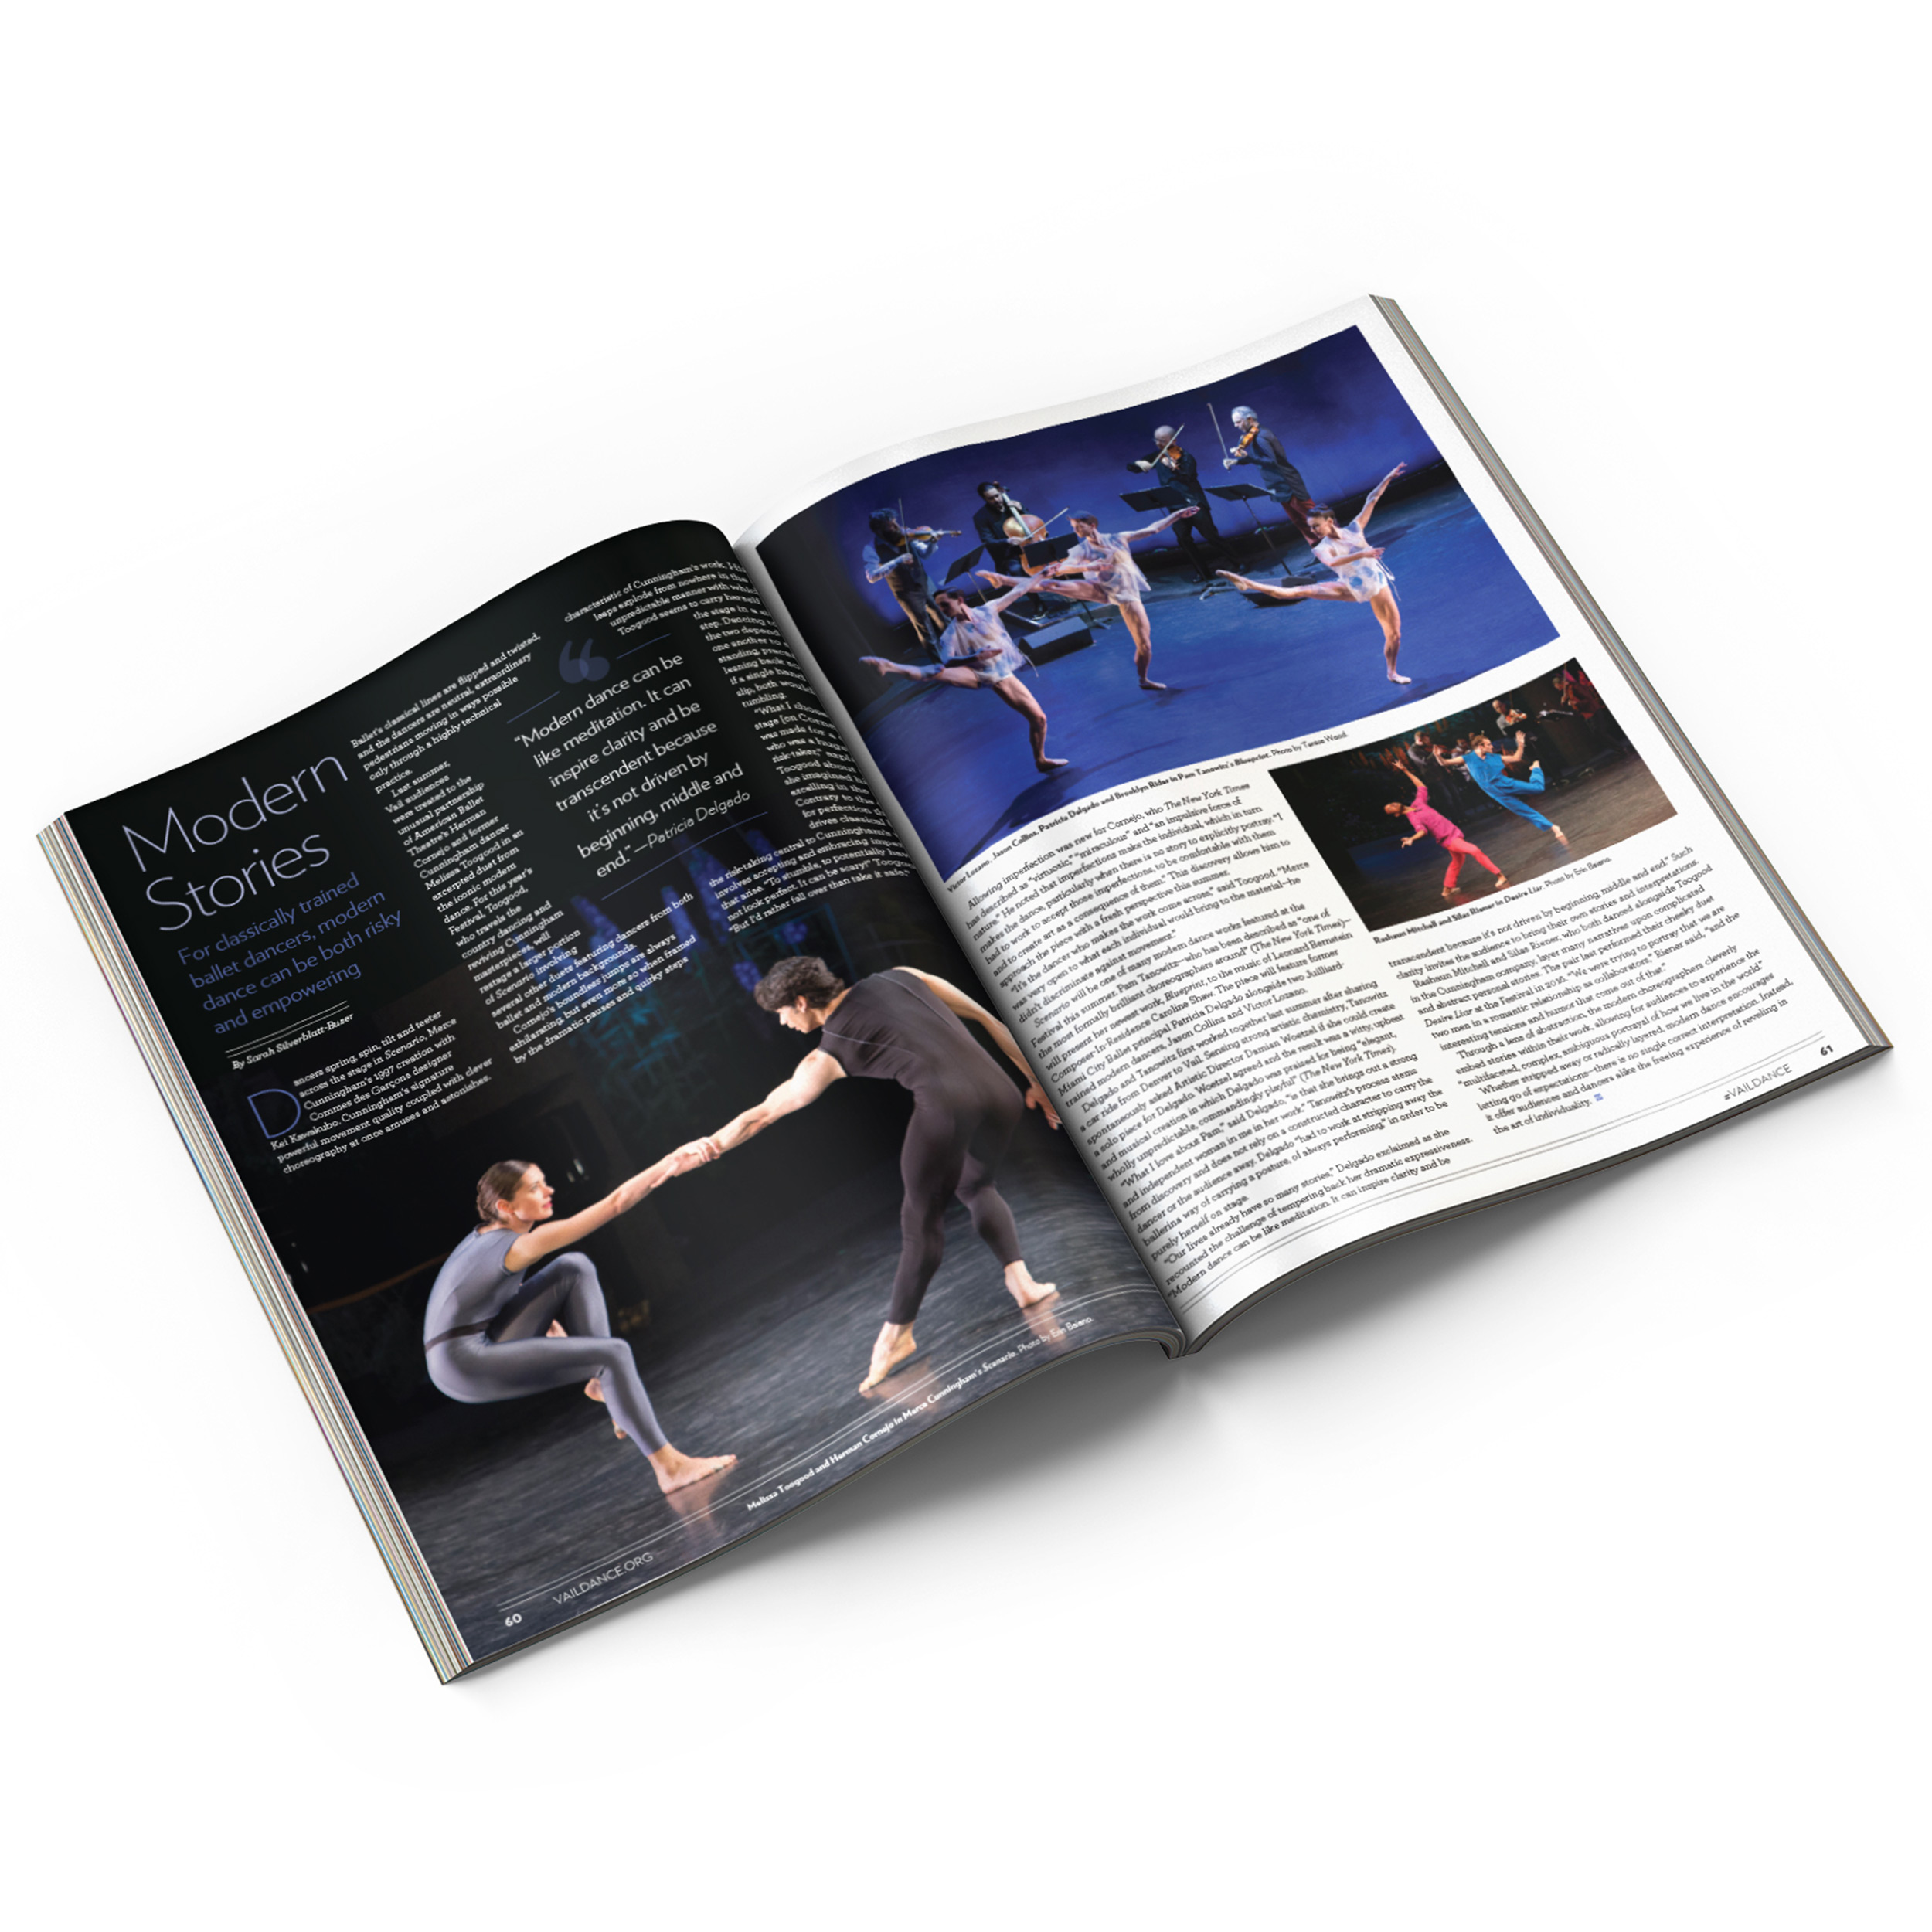 2018-vdf_advertising_magazine-pg21-22.jpg